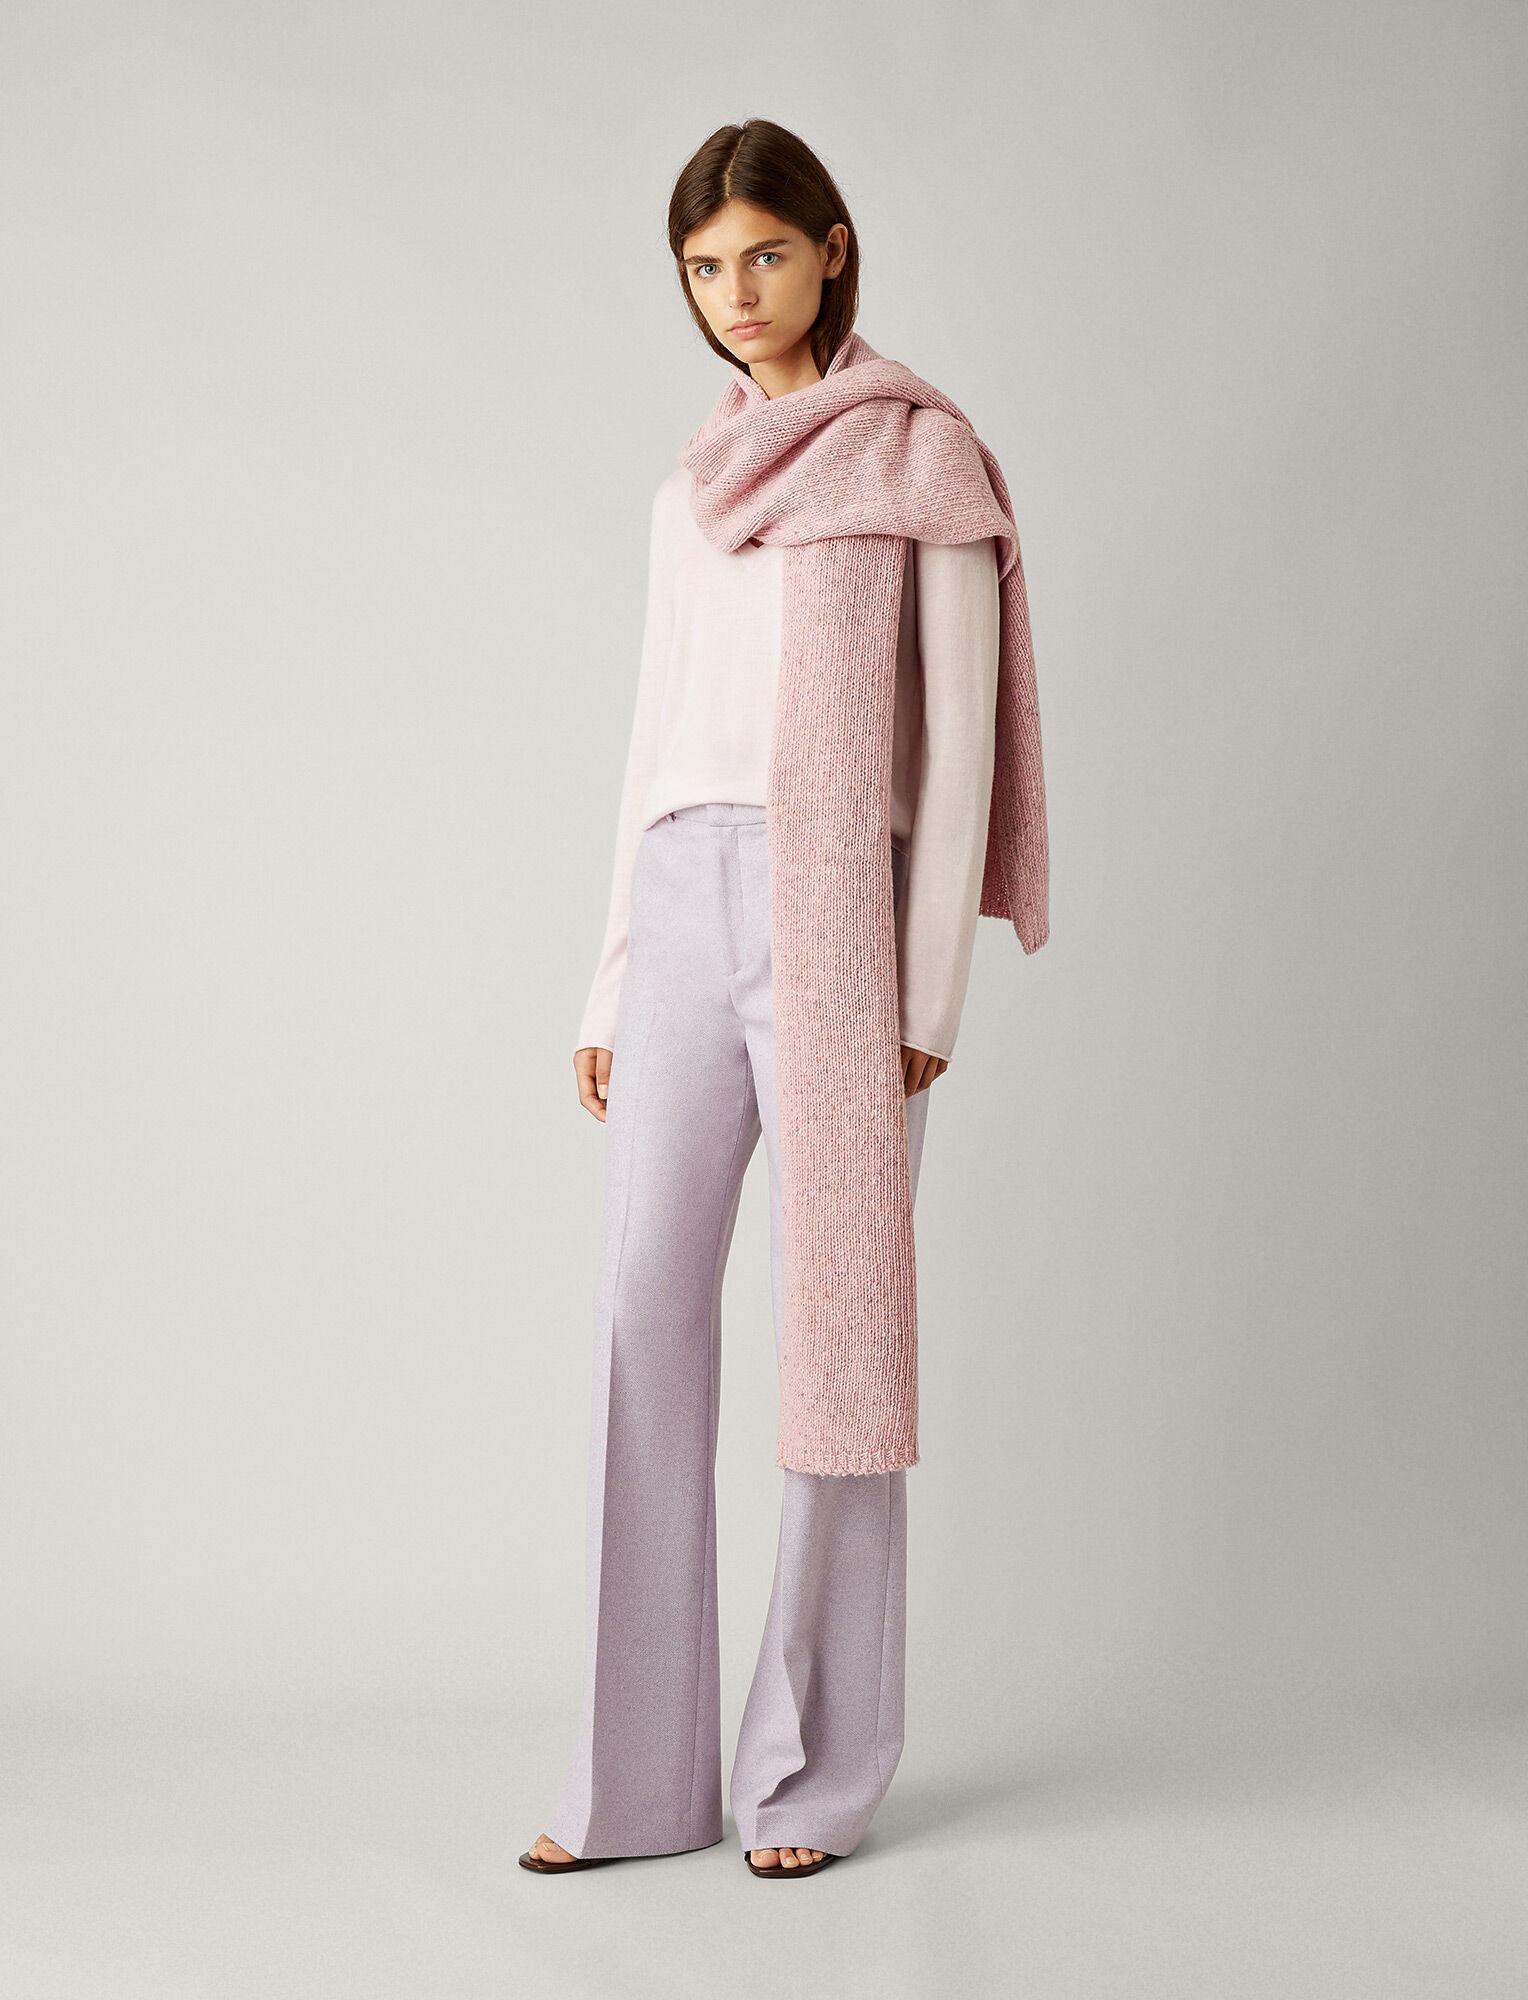 Joseph, Tweed Knit Scarf, in PINK